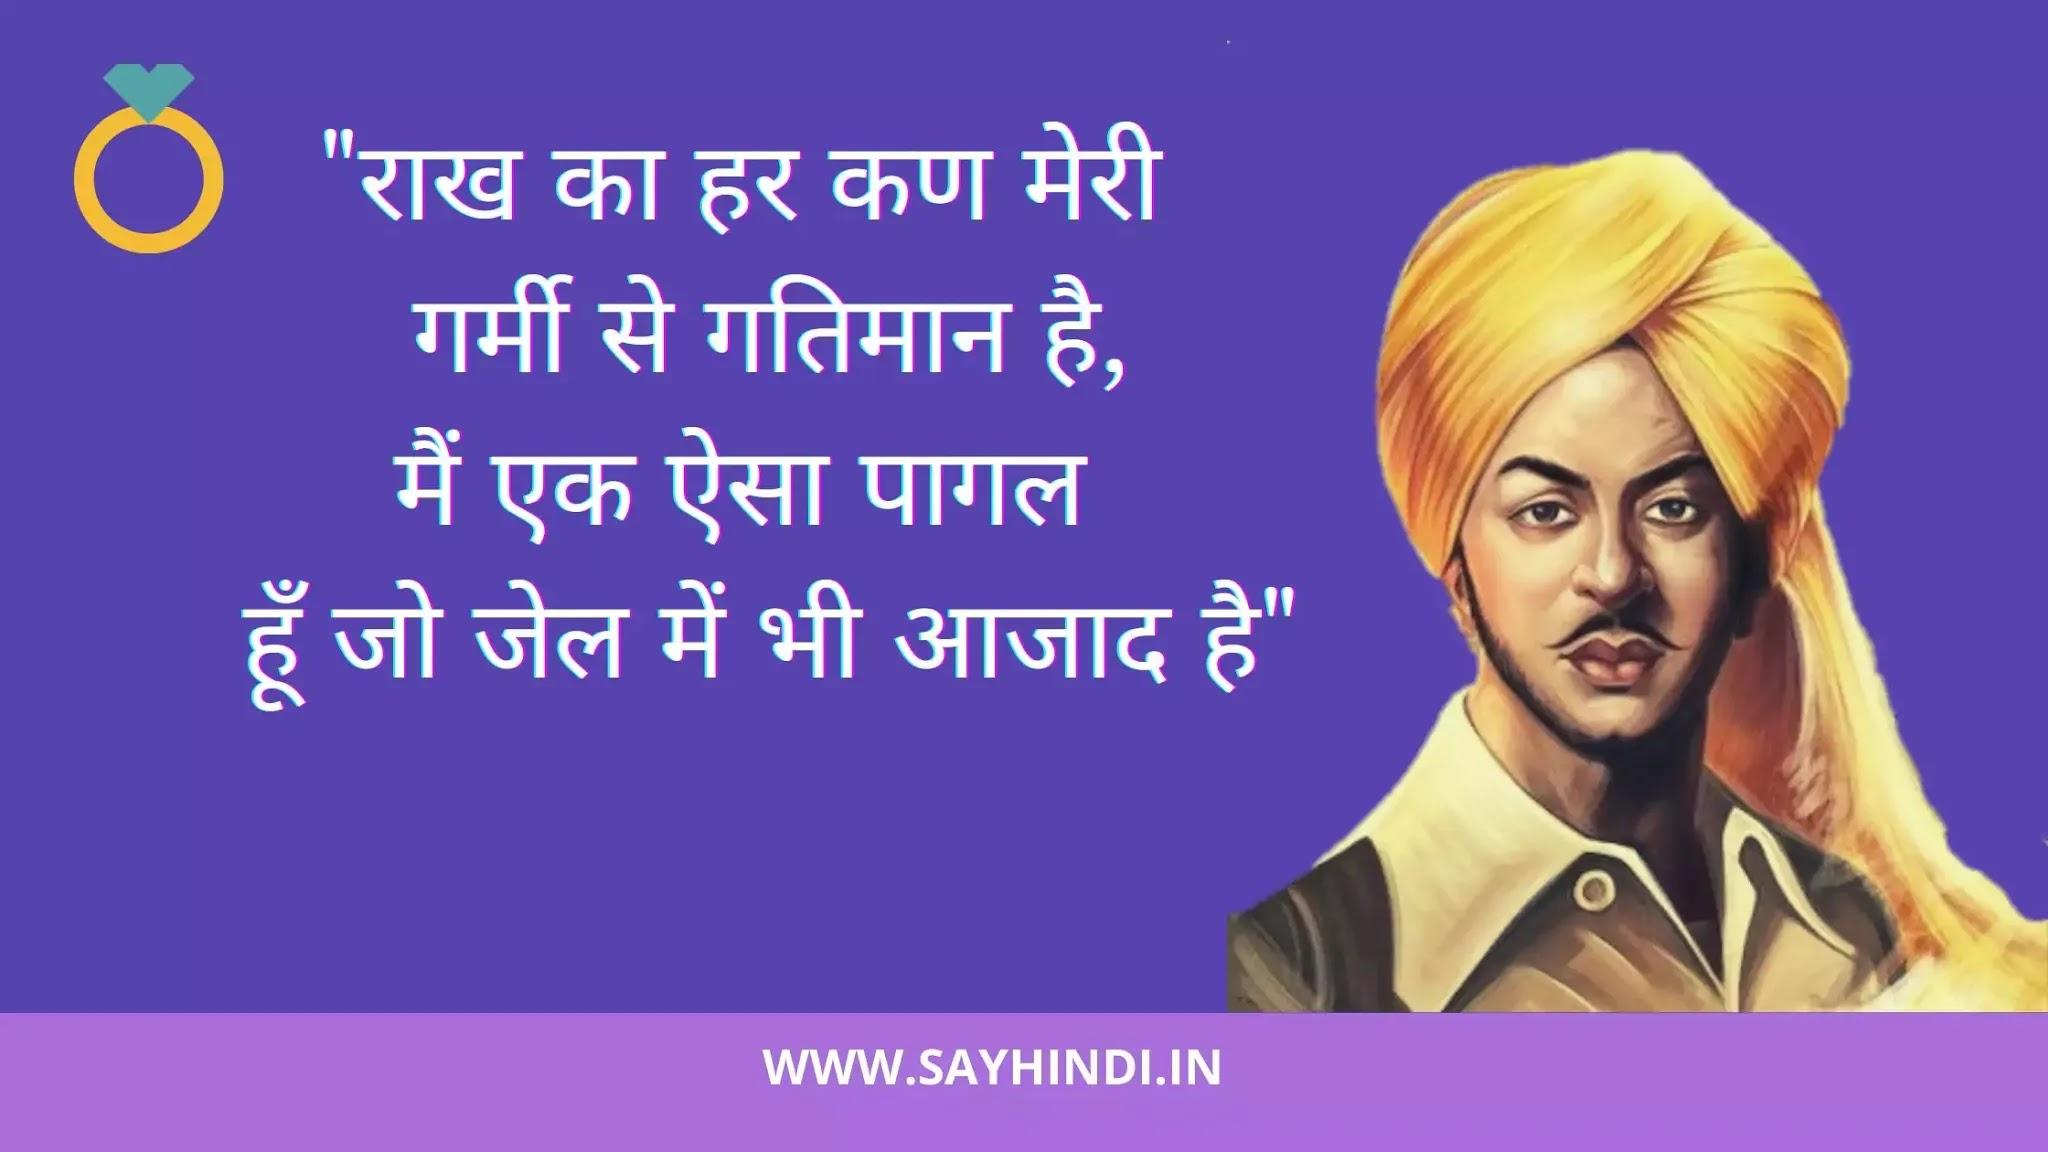 bhagat singh real photo, bhagat singh quotes